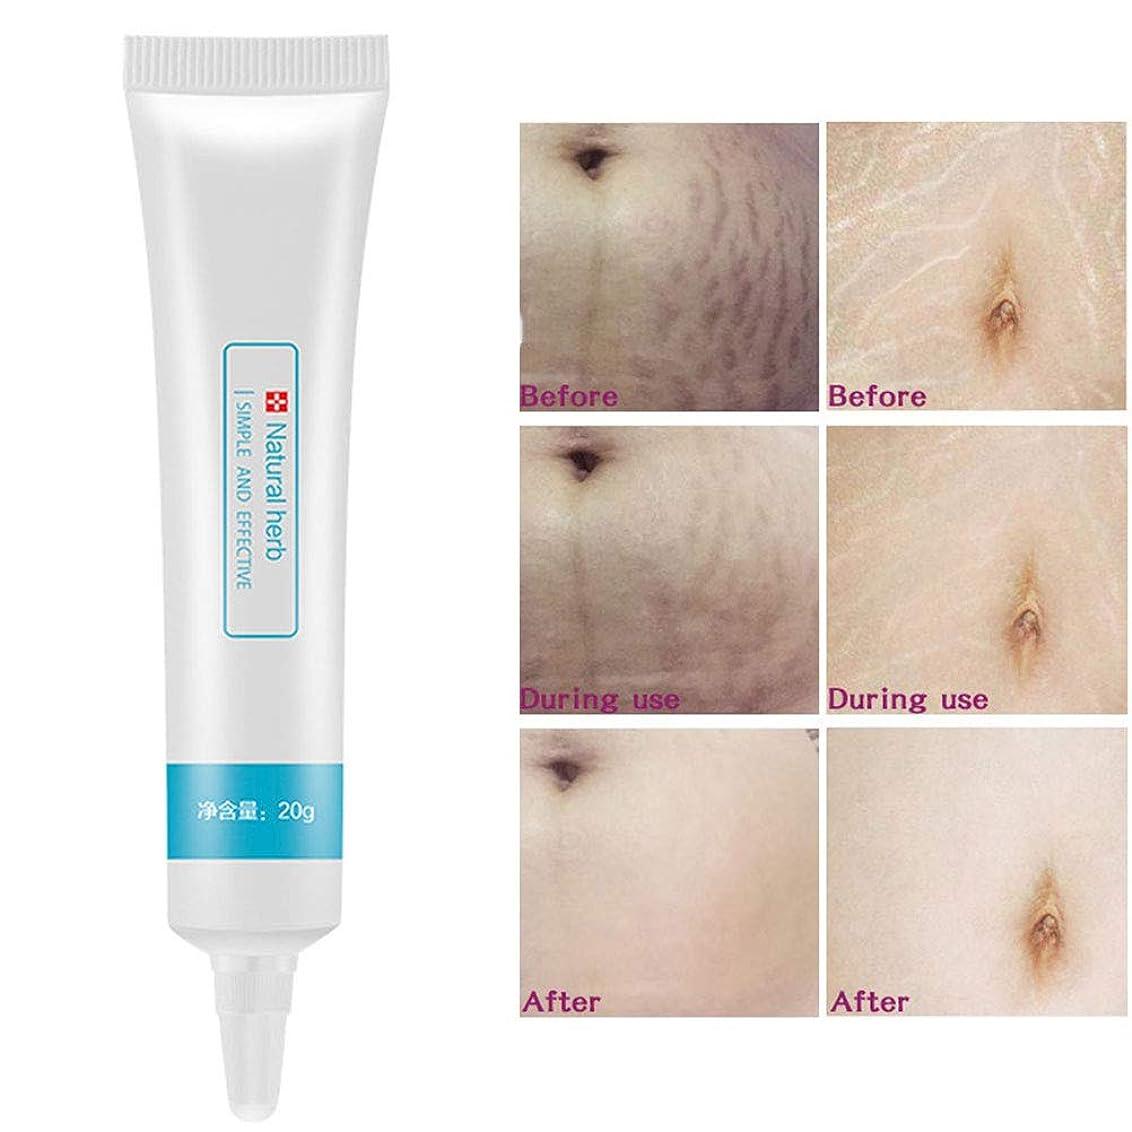 Creacom 瘢痕除去クリーム 修復クリーム 肌に栄養を与え 新陳代謝を促進し 修復手術の傷跡スキンケア ボディスキンケア にきび除去 モイスチャライザー クリーム修復傷 傷跡 除去 20g